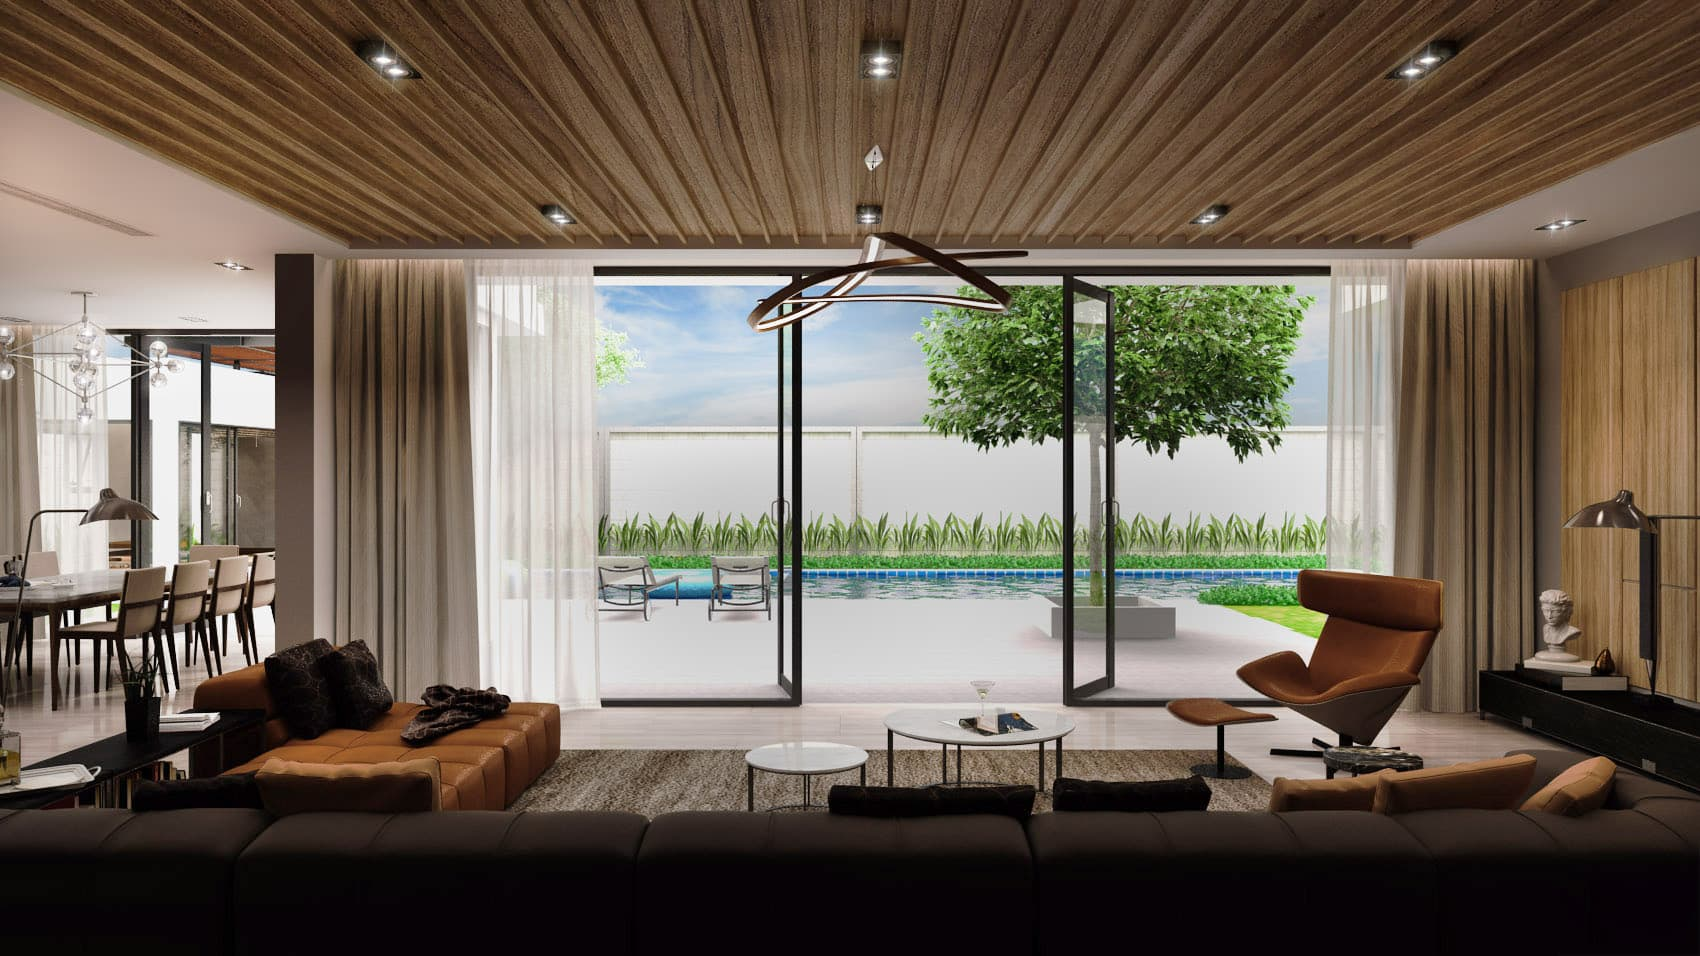 Villa Thuan - Interior Design & 3D Rendering